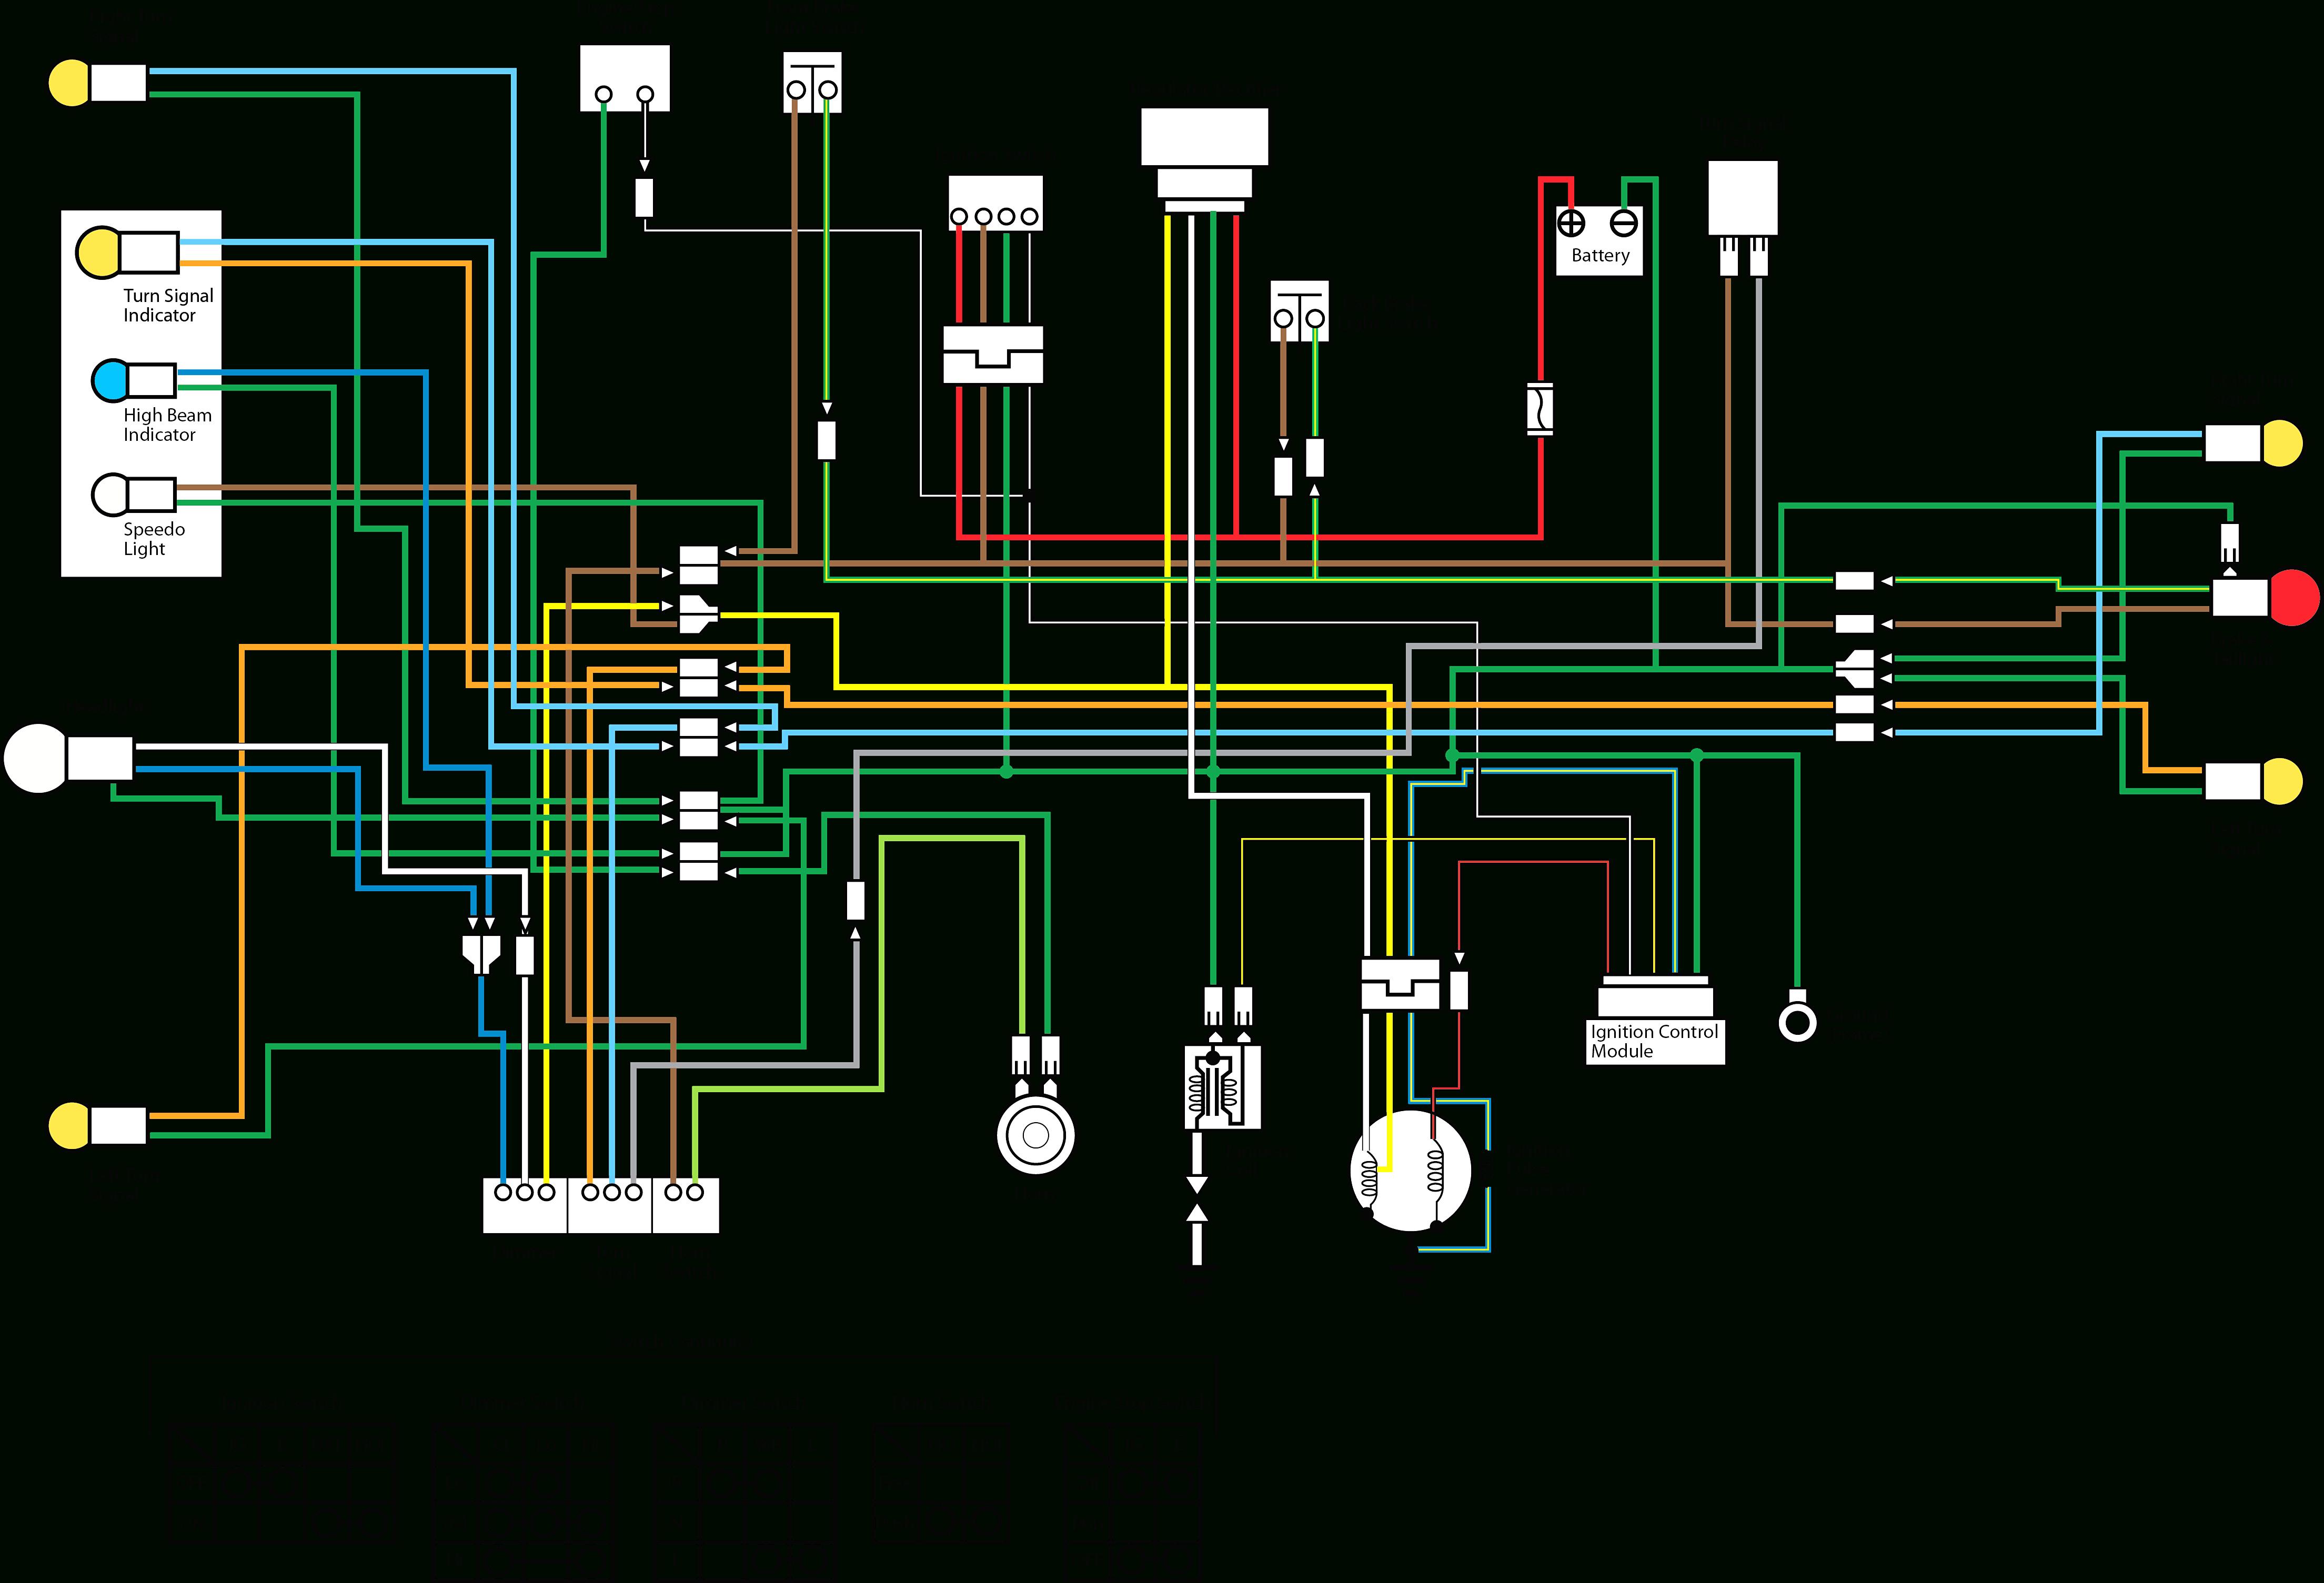 Xr600 Wiring Diagram – Volovets - Honda Motorcycle Wiring Diagram